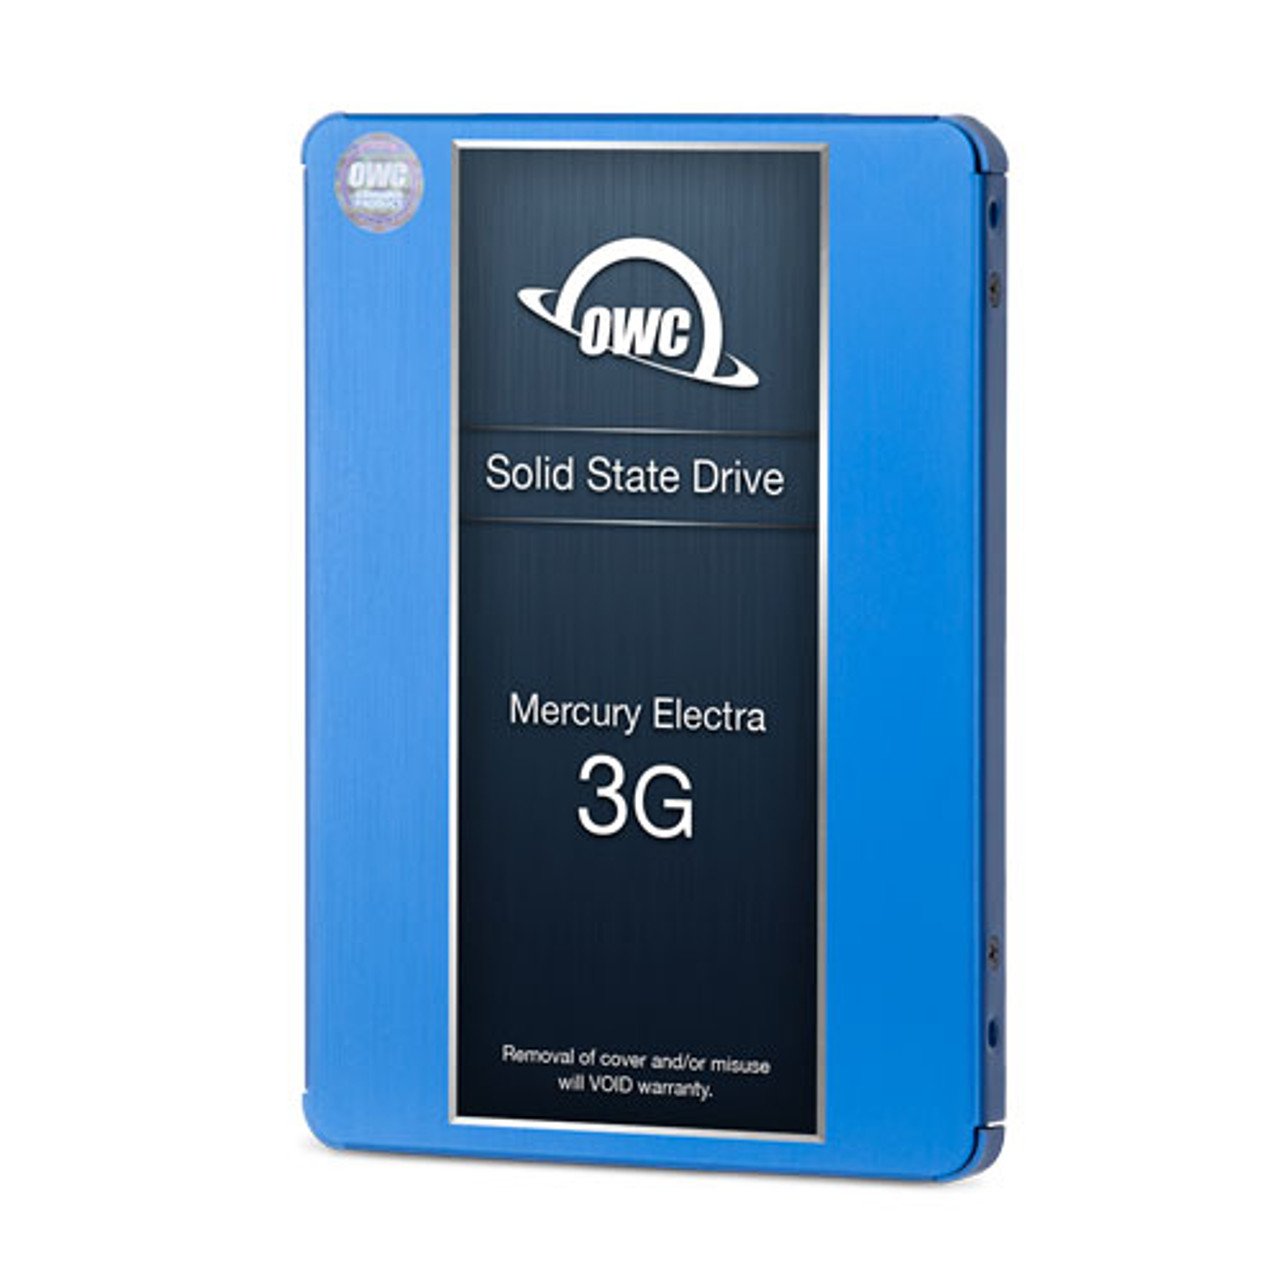 OWC 500GB Mercury Electra 3G SSD and Adapta-Drive 2.5-inch to 3.5-inch DIY bundle kit